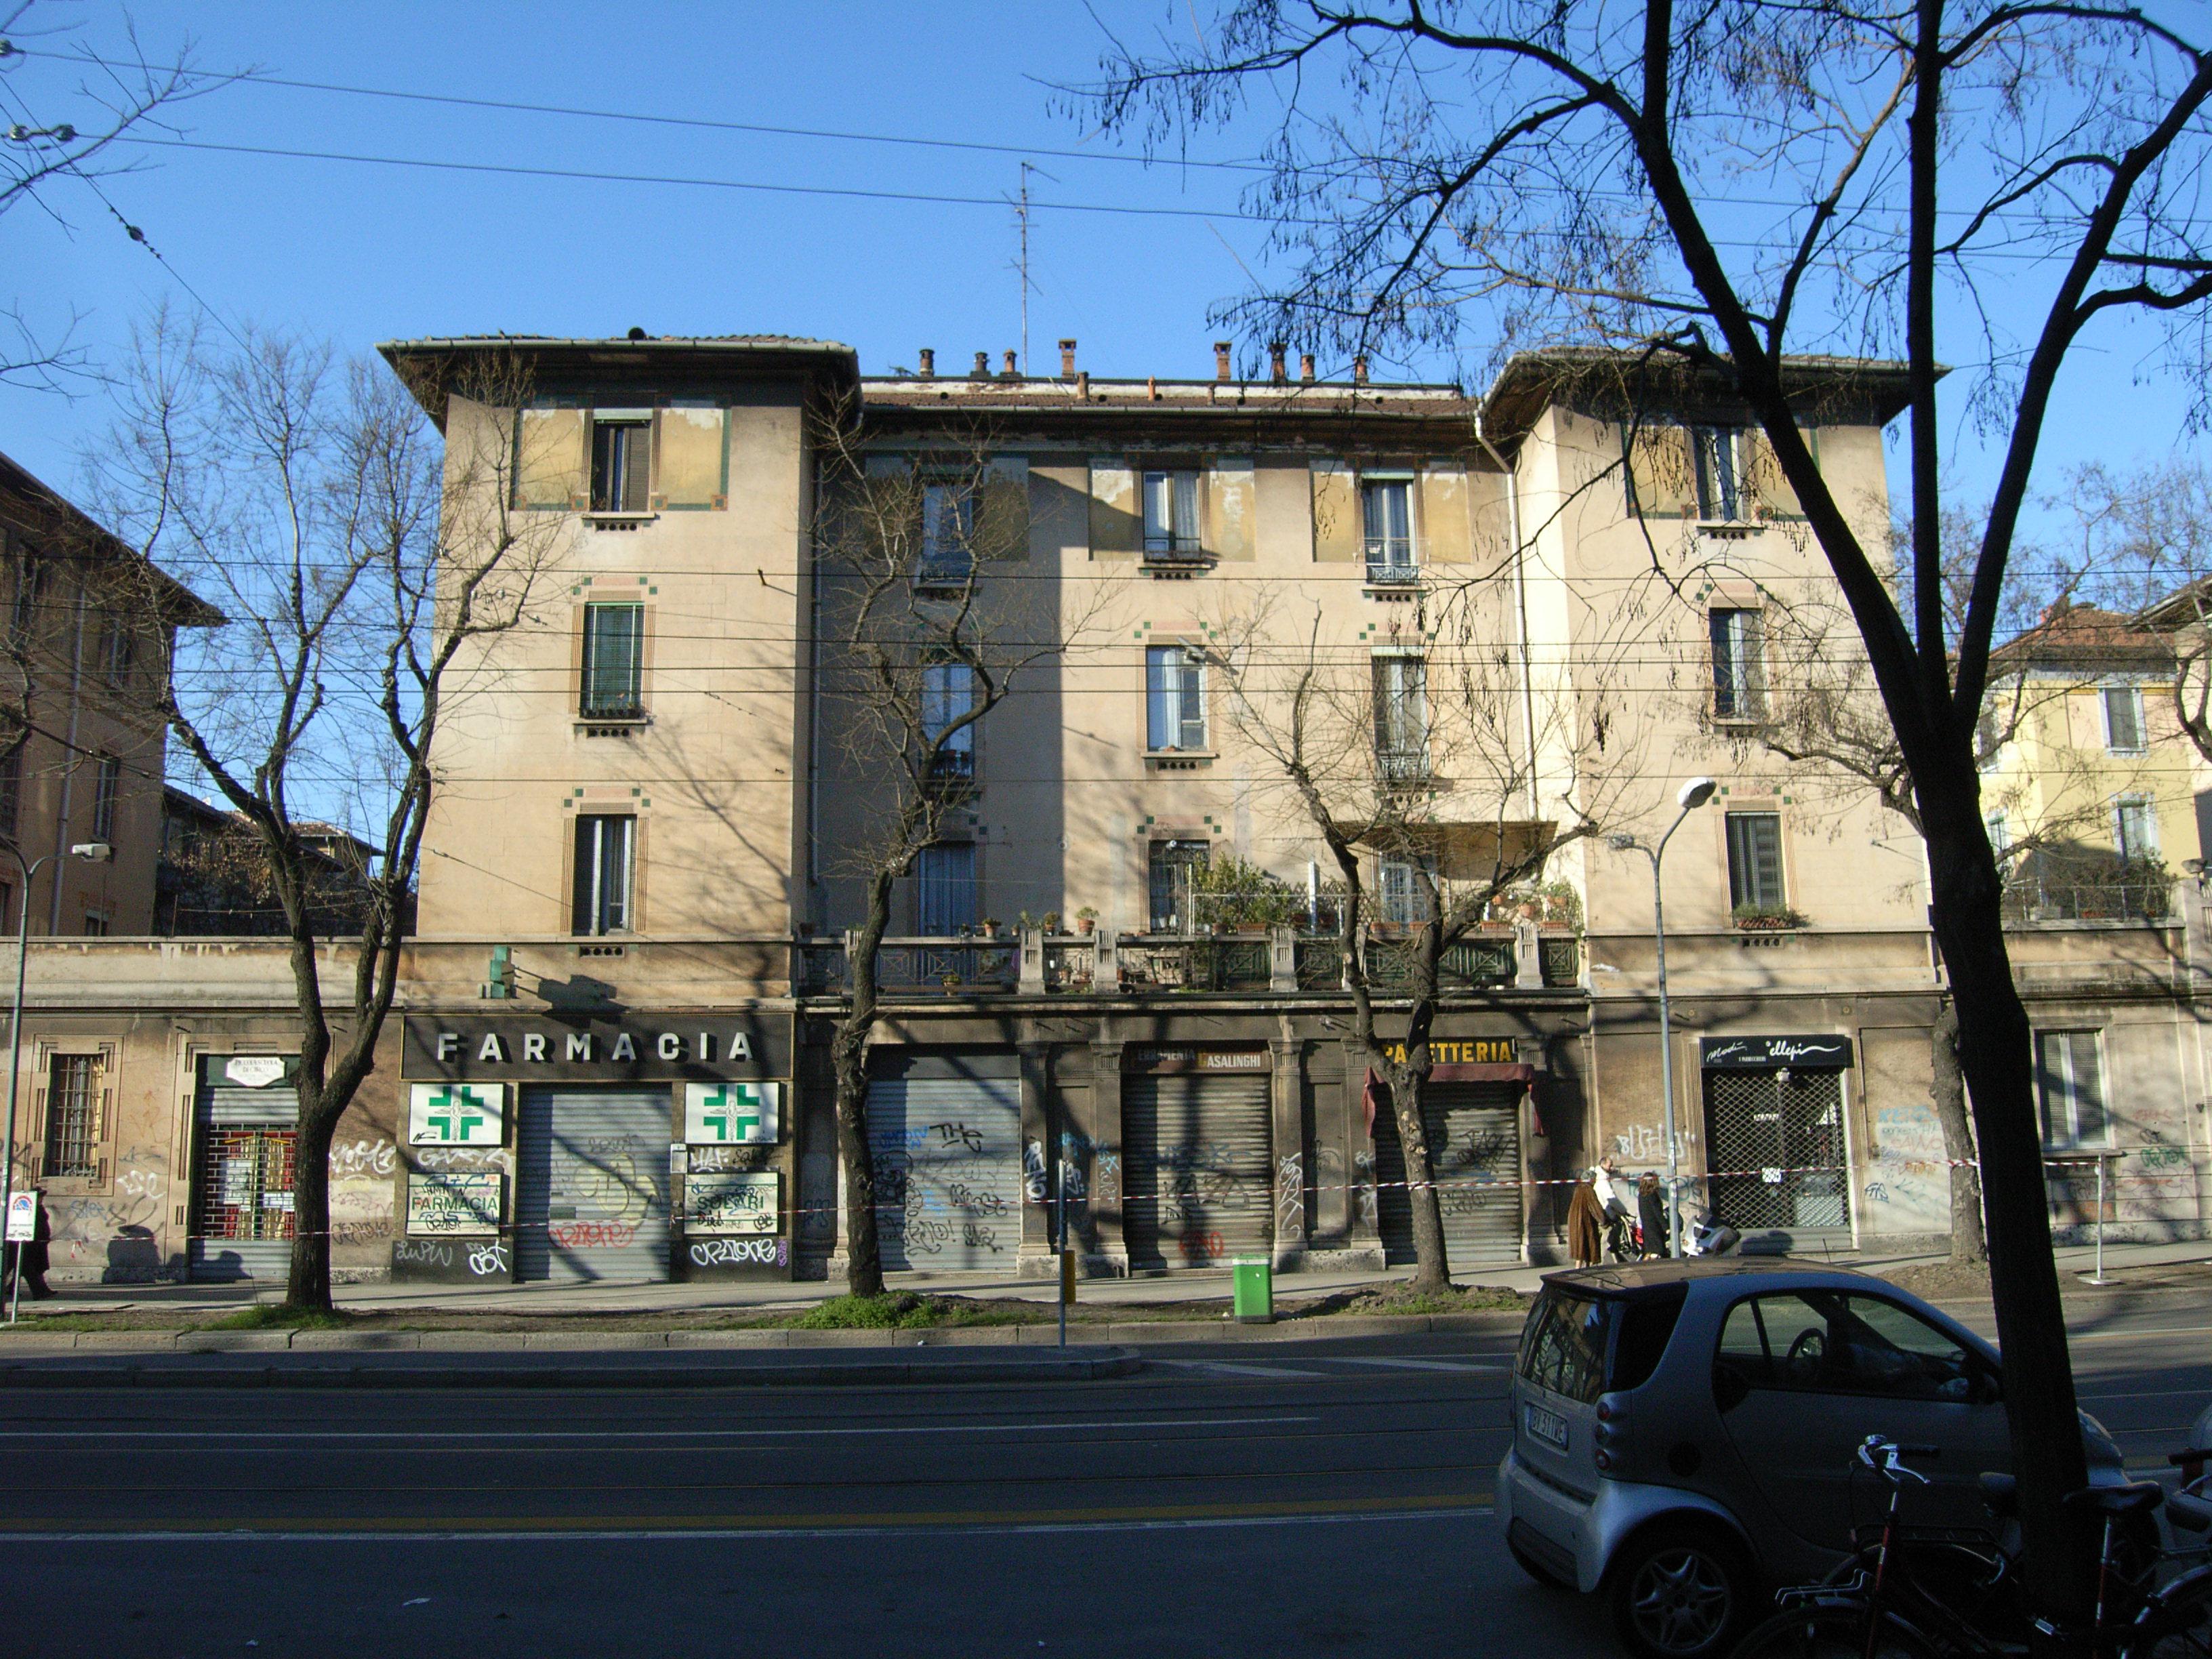 milano-umanitaria-viasolari-1135332-o